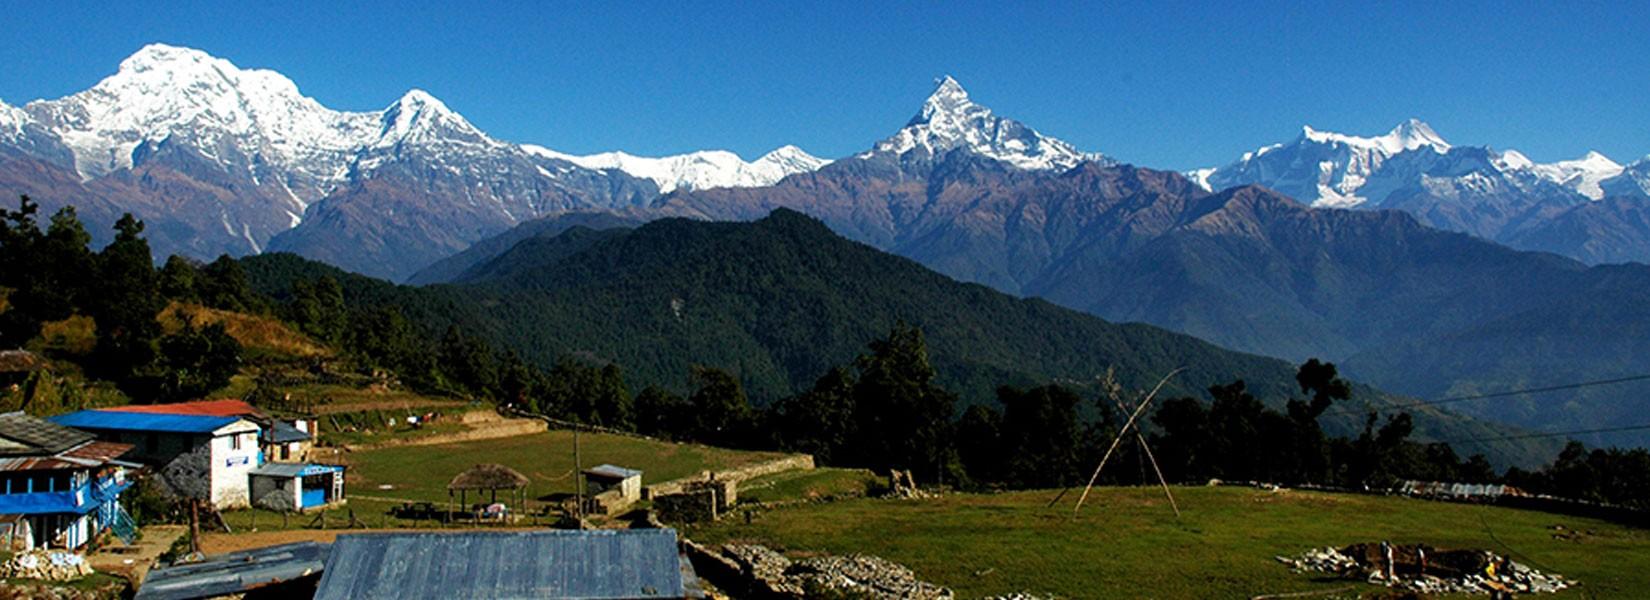 Australian Camp Nepal